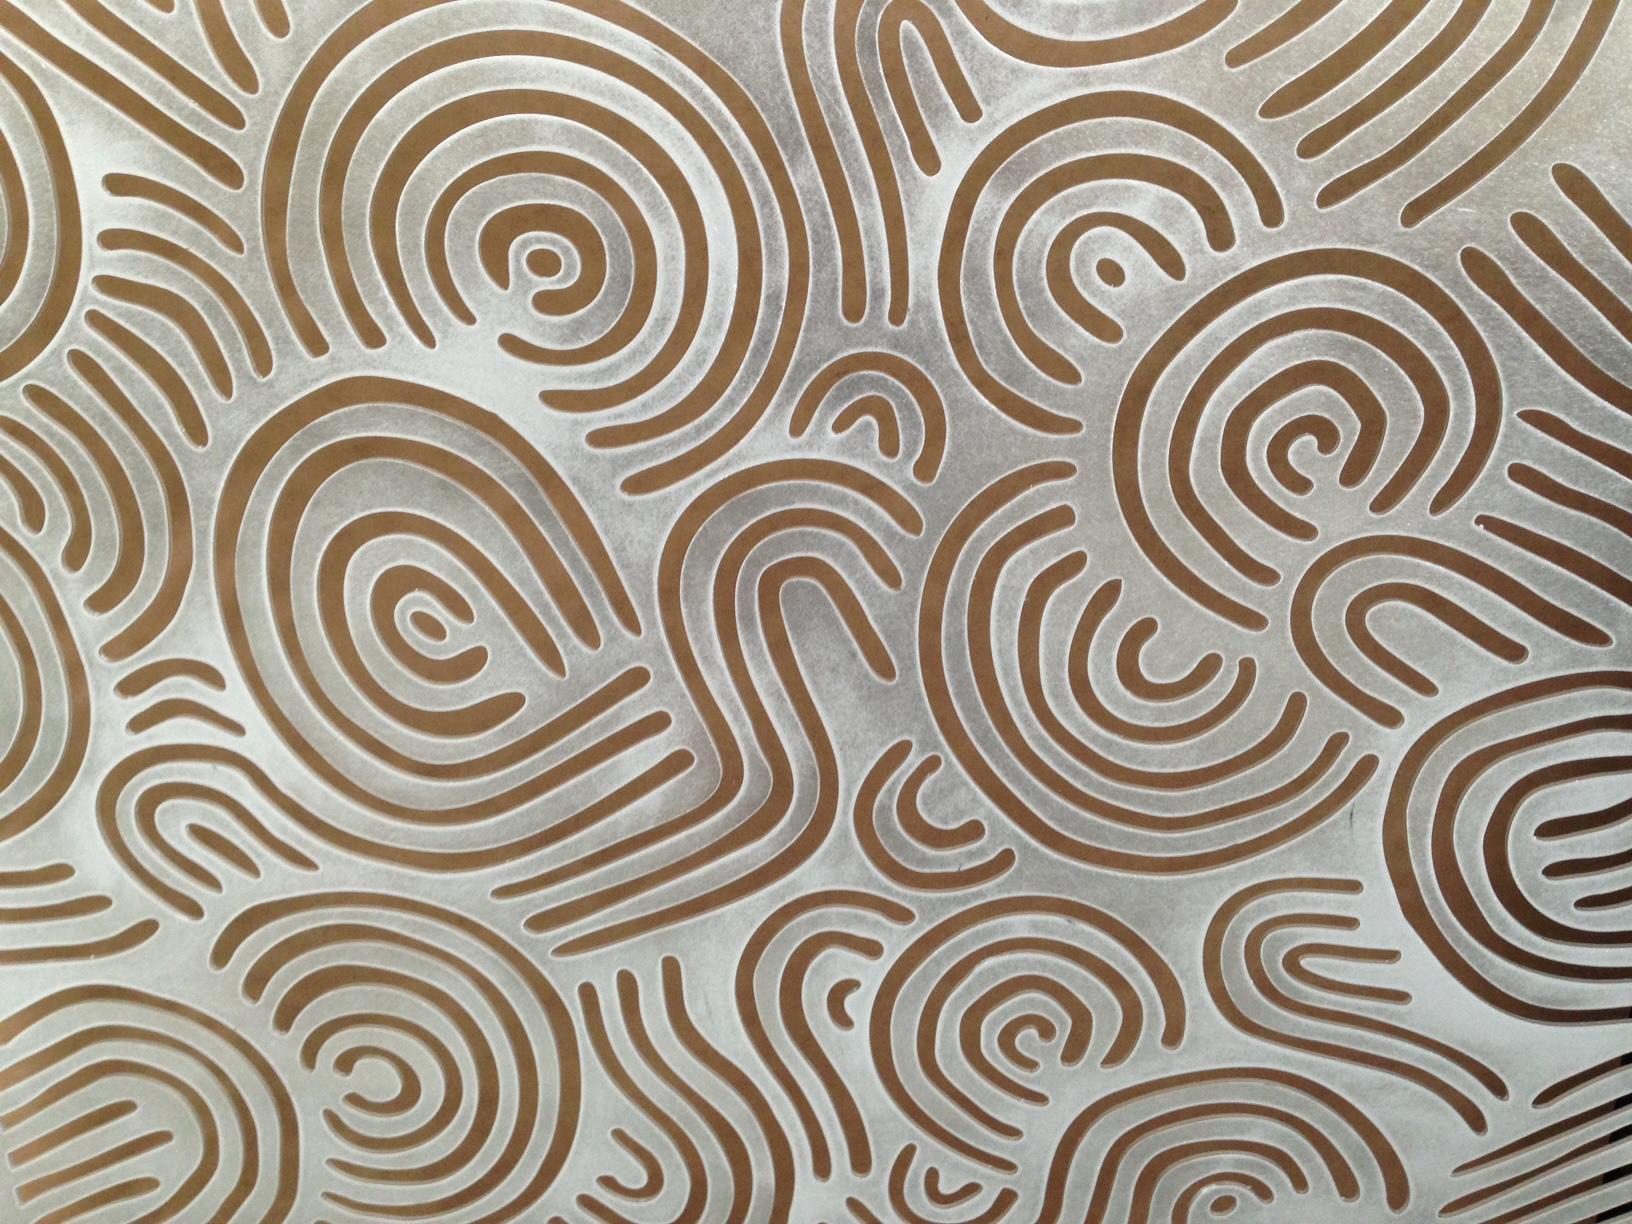 Deco Swirls pattern detail